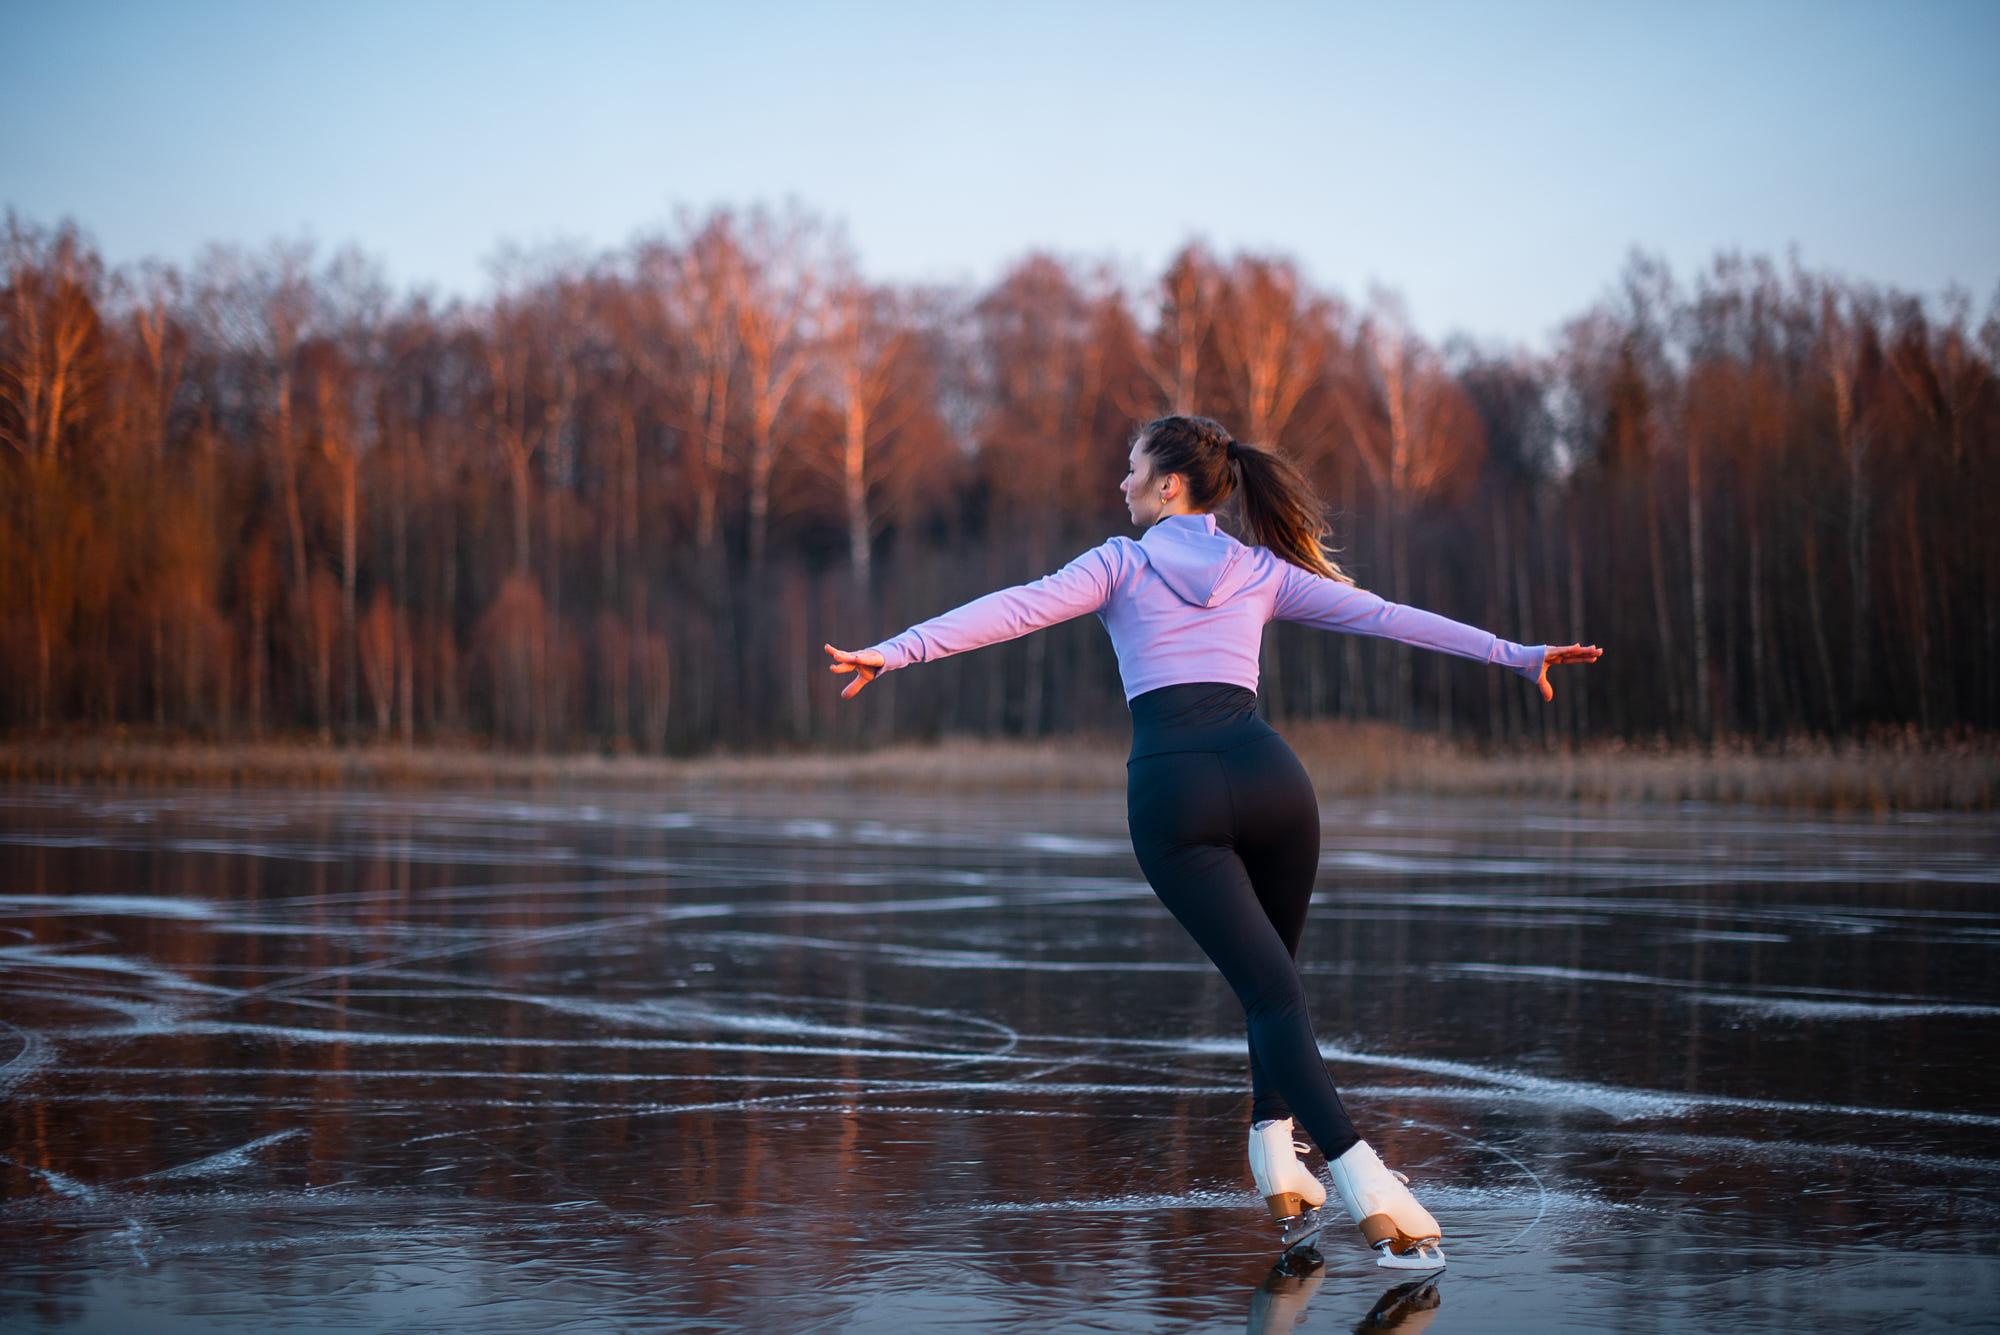 Wallpaper Women Model Yoga Pants Leggings Ponytail Ice Skate Dancing Brunette Nature Frozen Lake Sweater Depth Of Field 2000x1335 Javalonte 1764453 Hd Wallpapers Wallhere